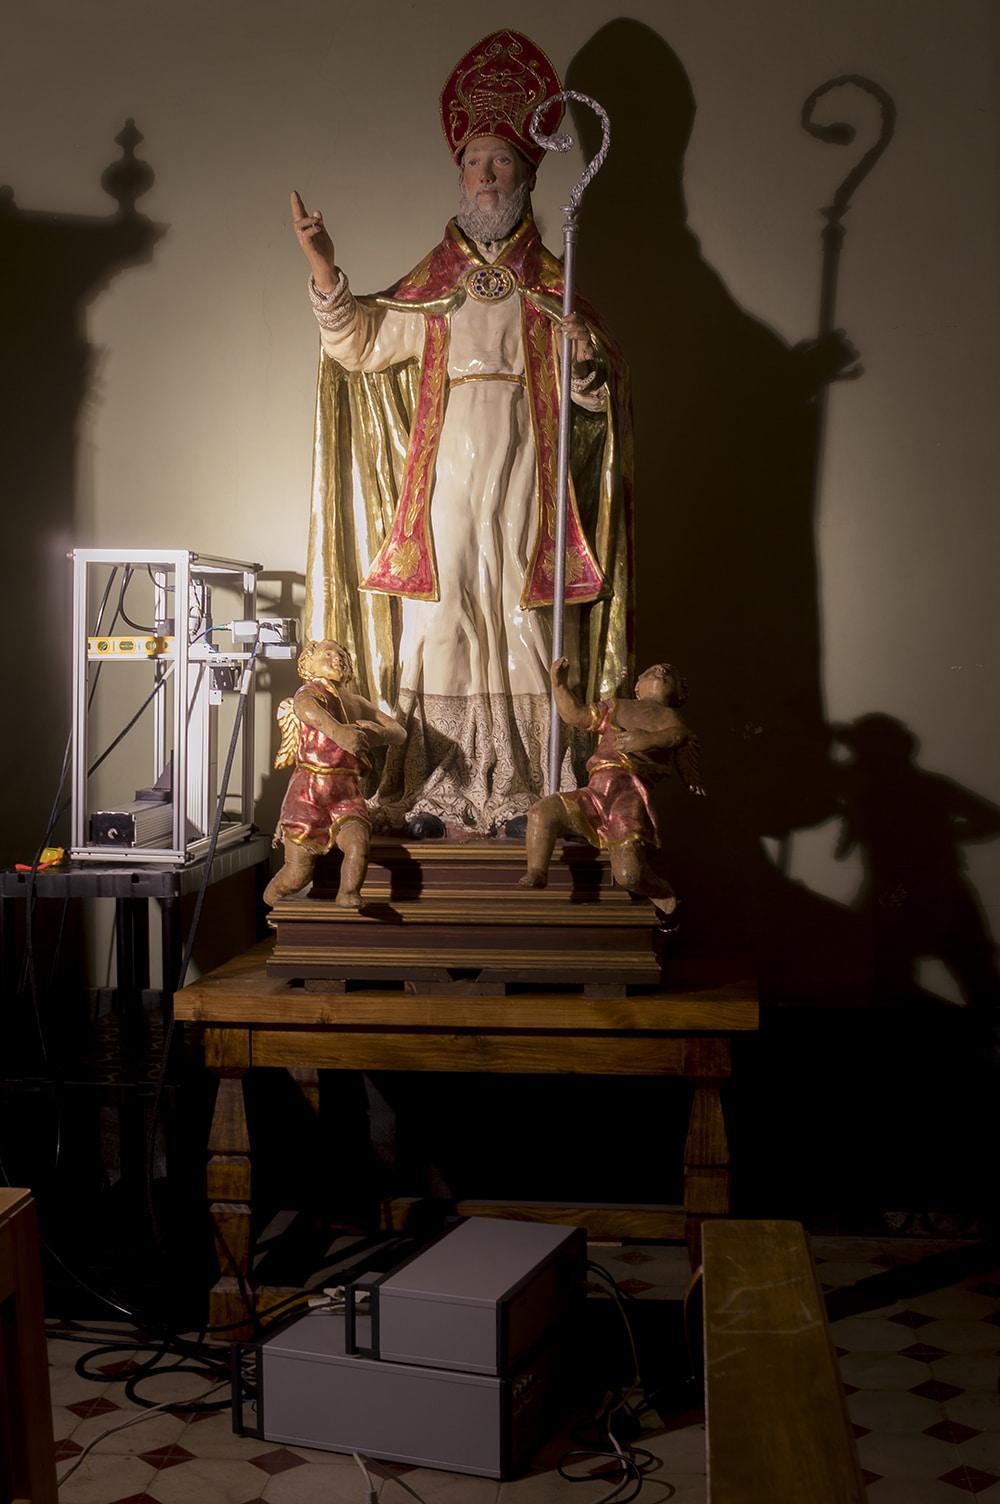 TERAHERTZ IMAGING Aci Sant'Antonio